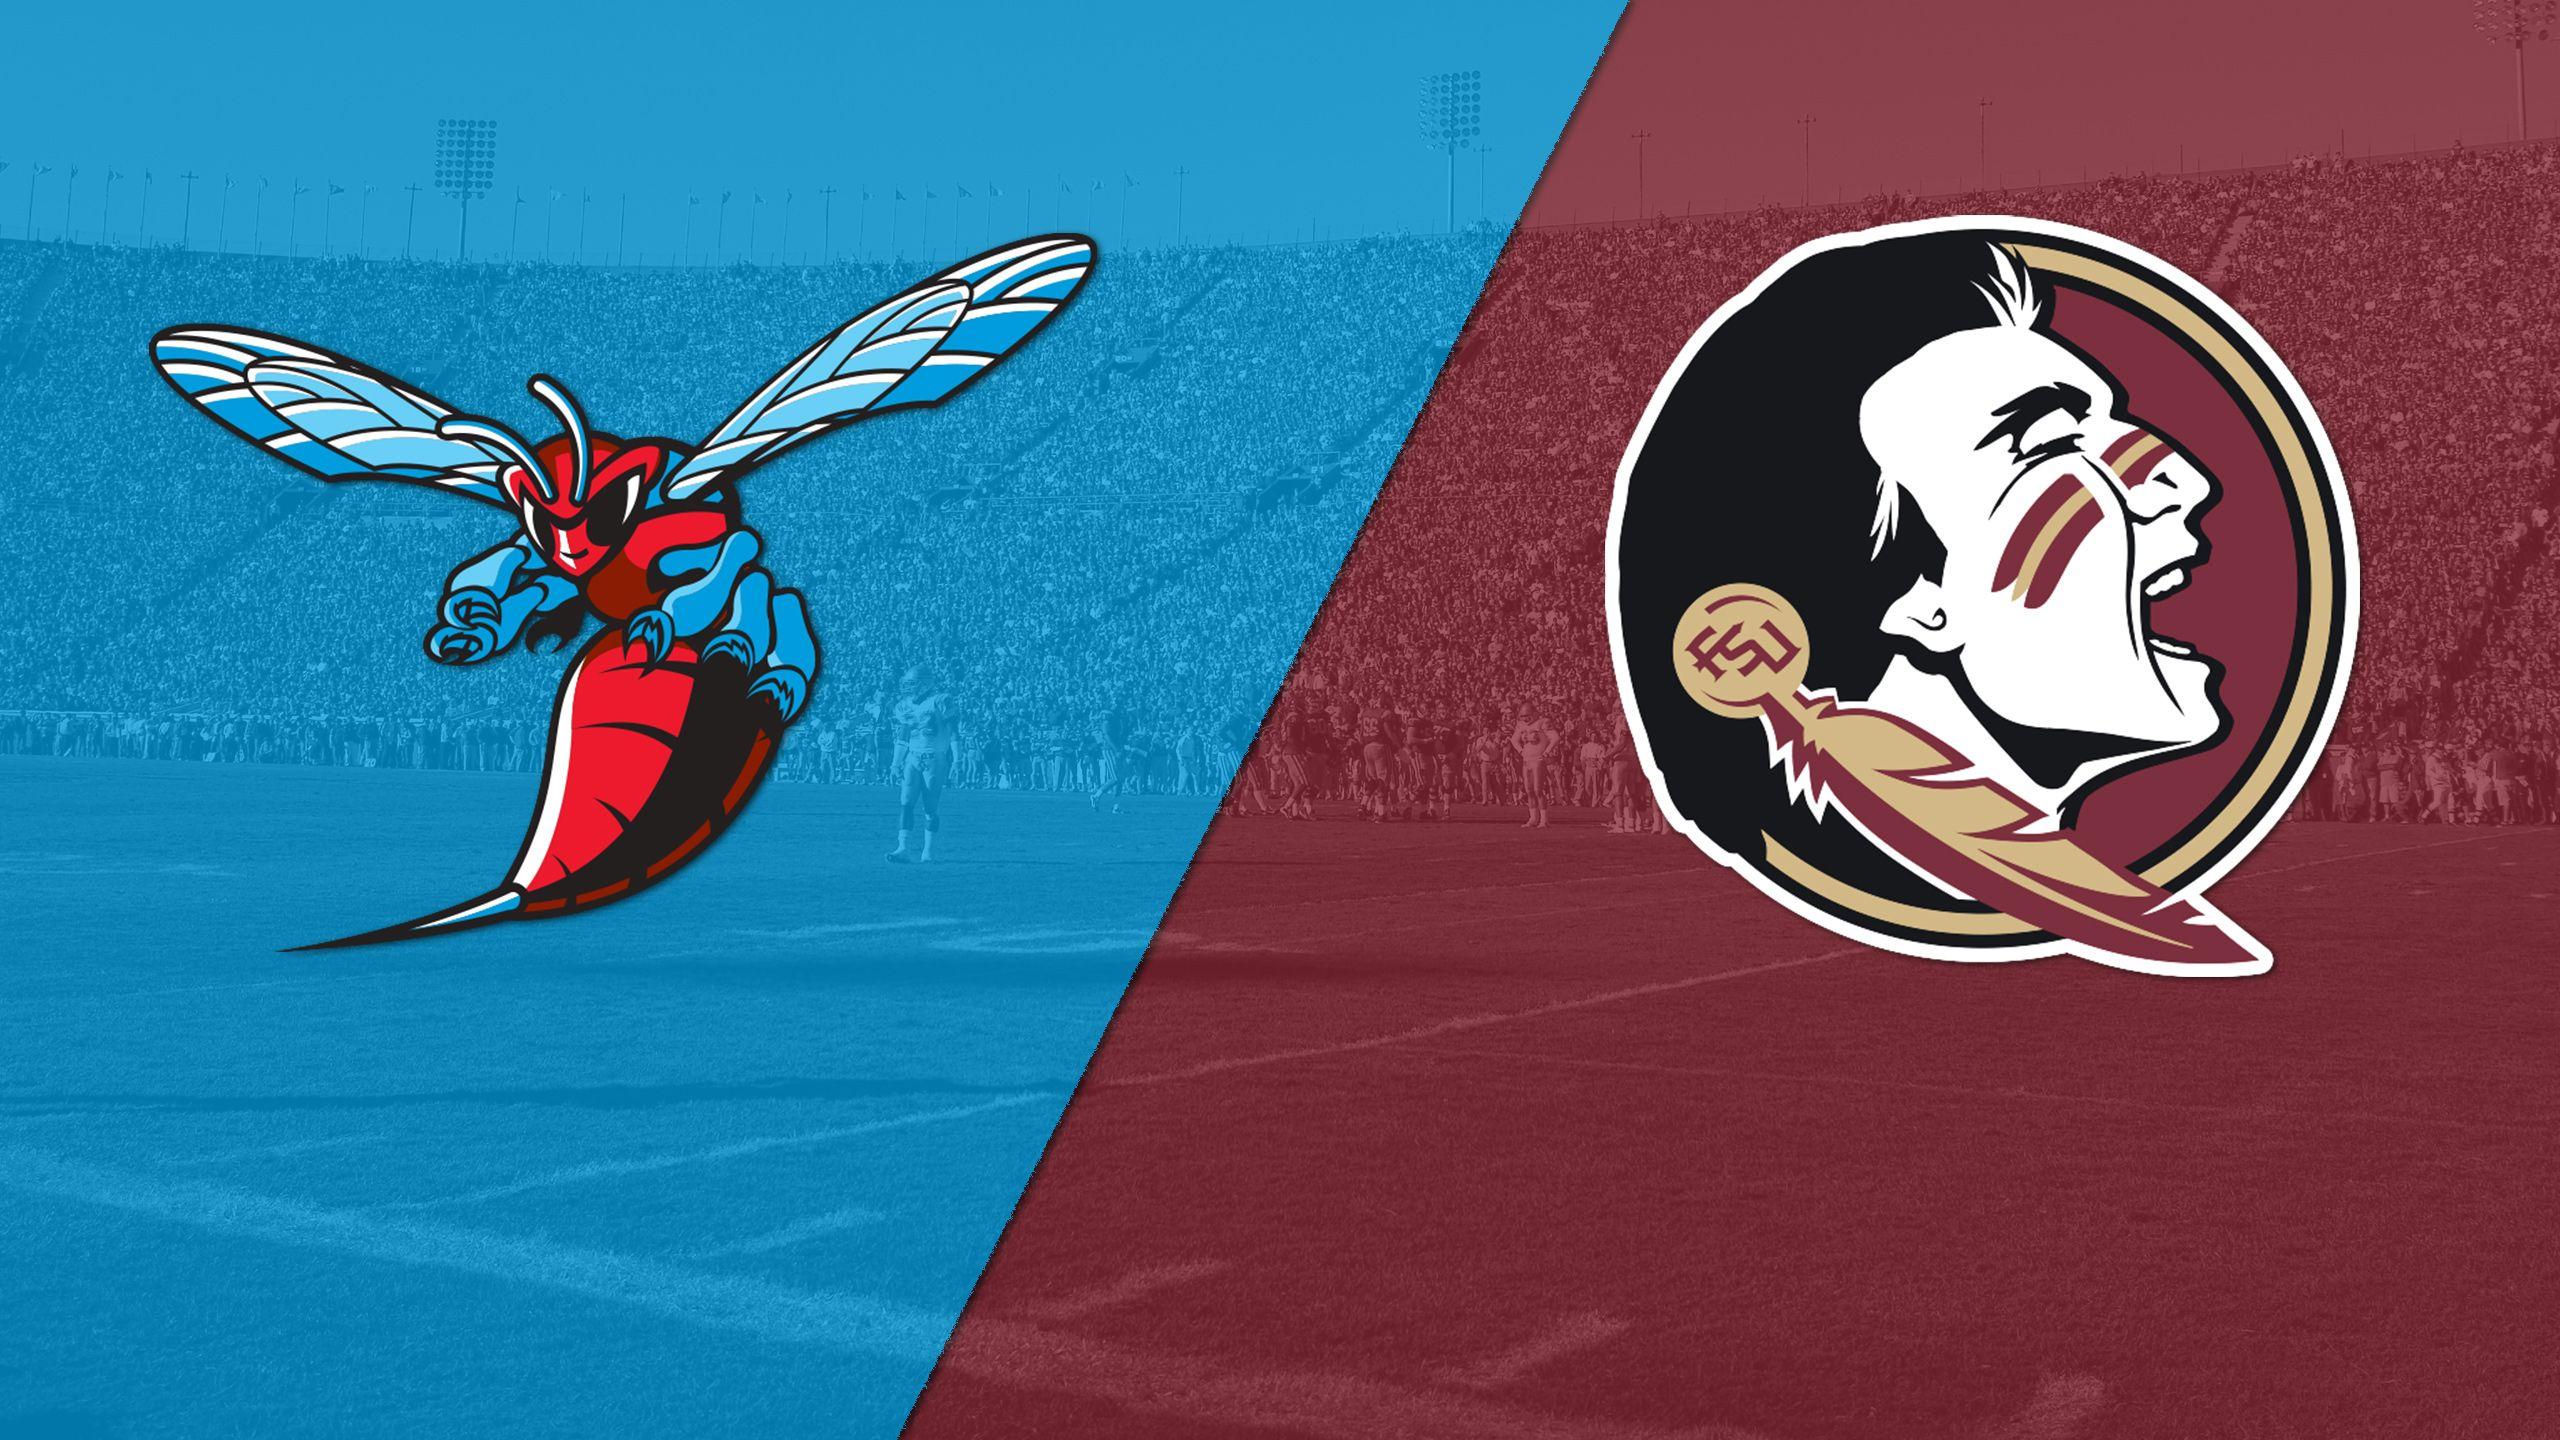 Delaware State vs. Florida State (Football)